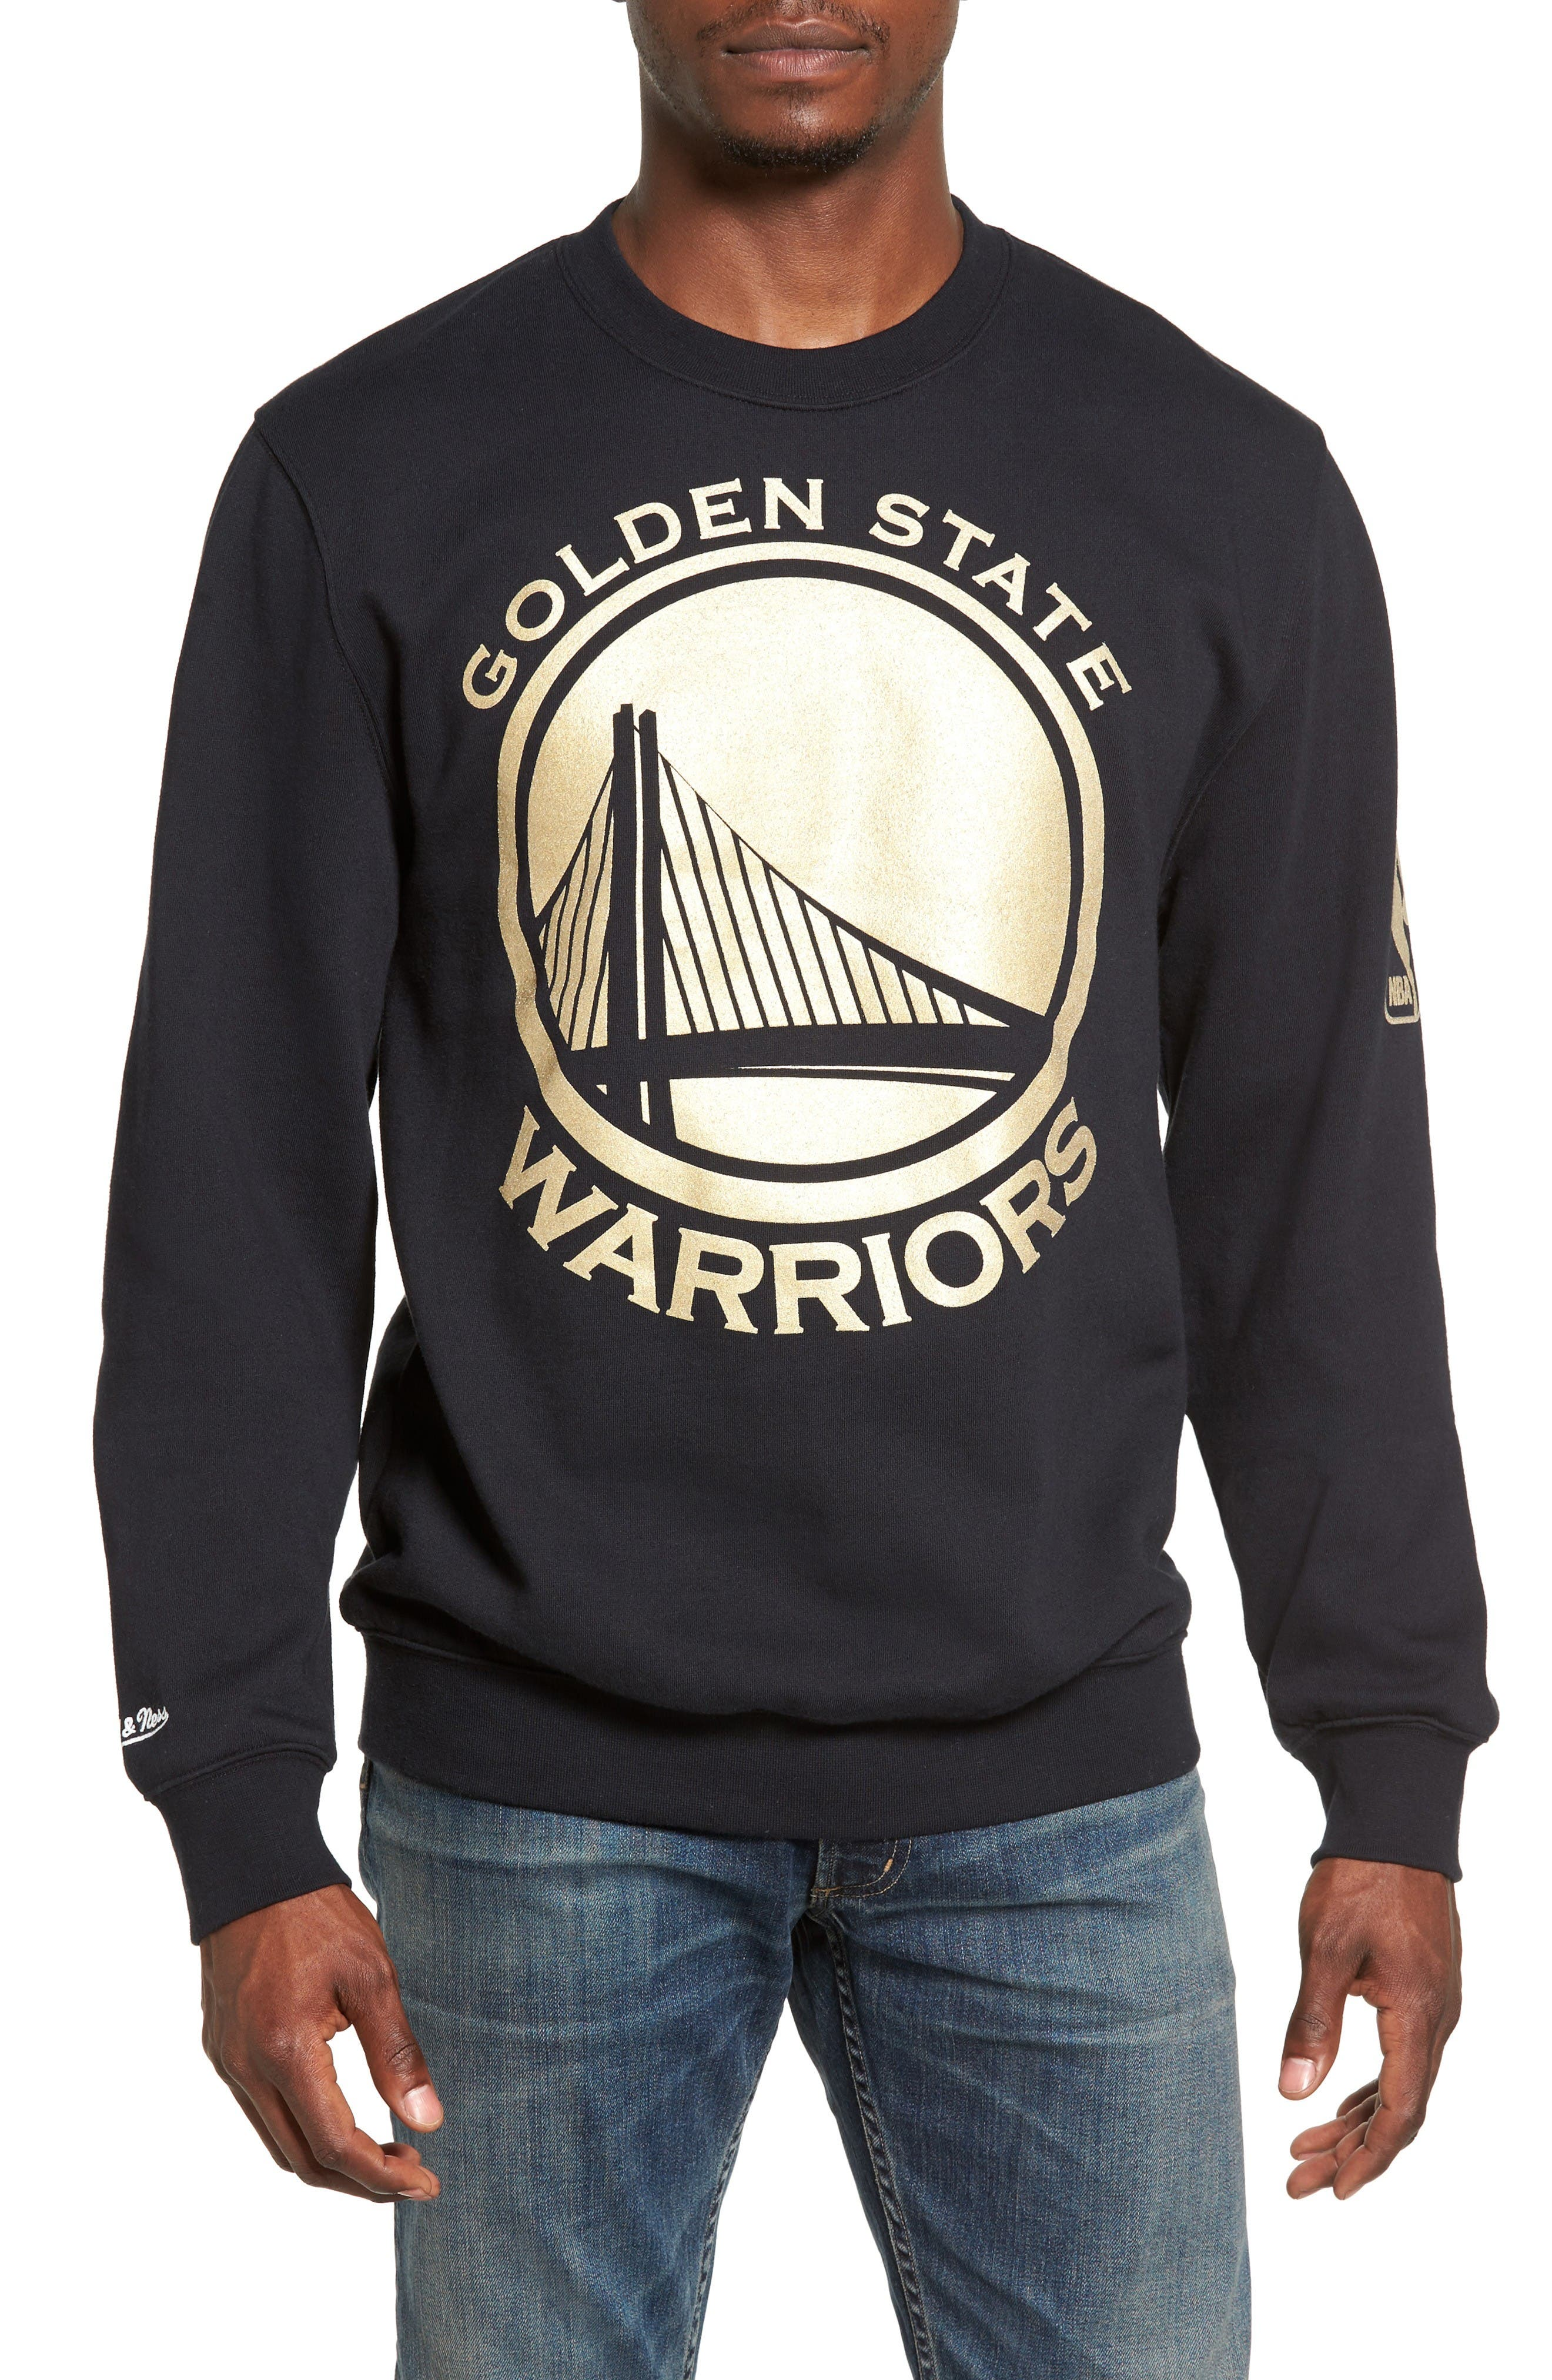 Mitchell & Ness NBA Win Percentage - Golden State Warriors Sweatshirt